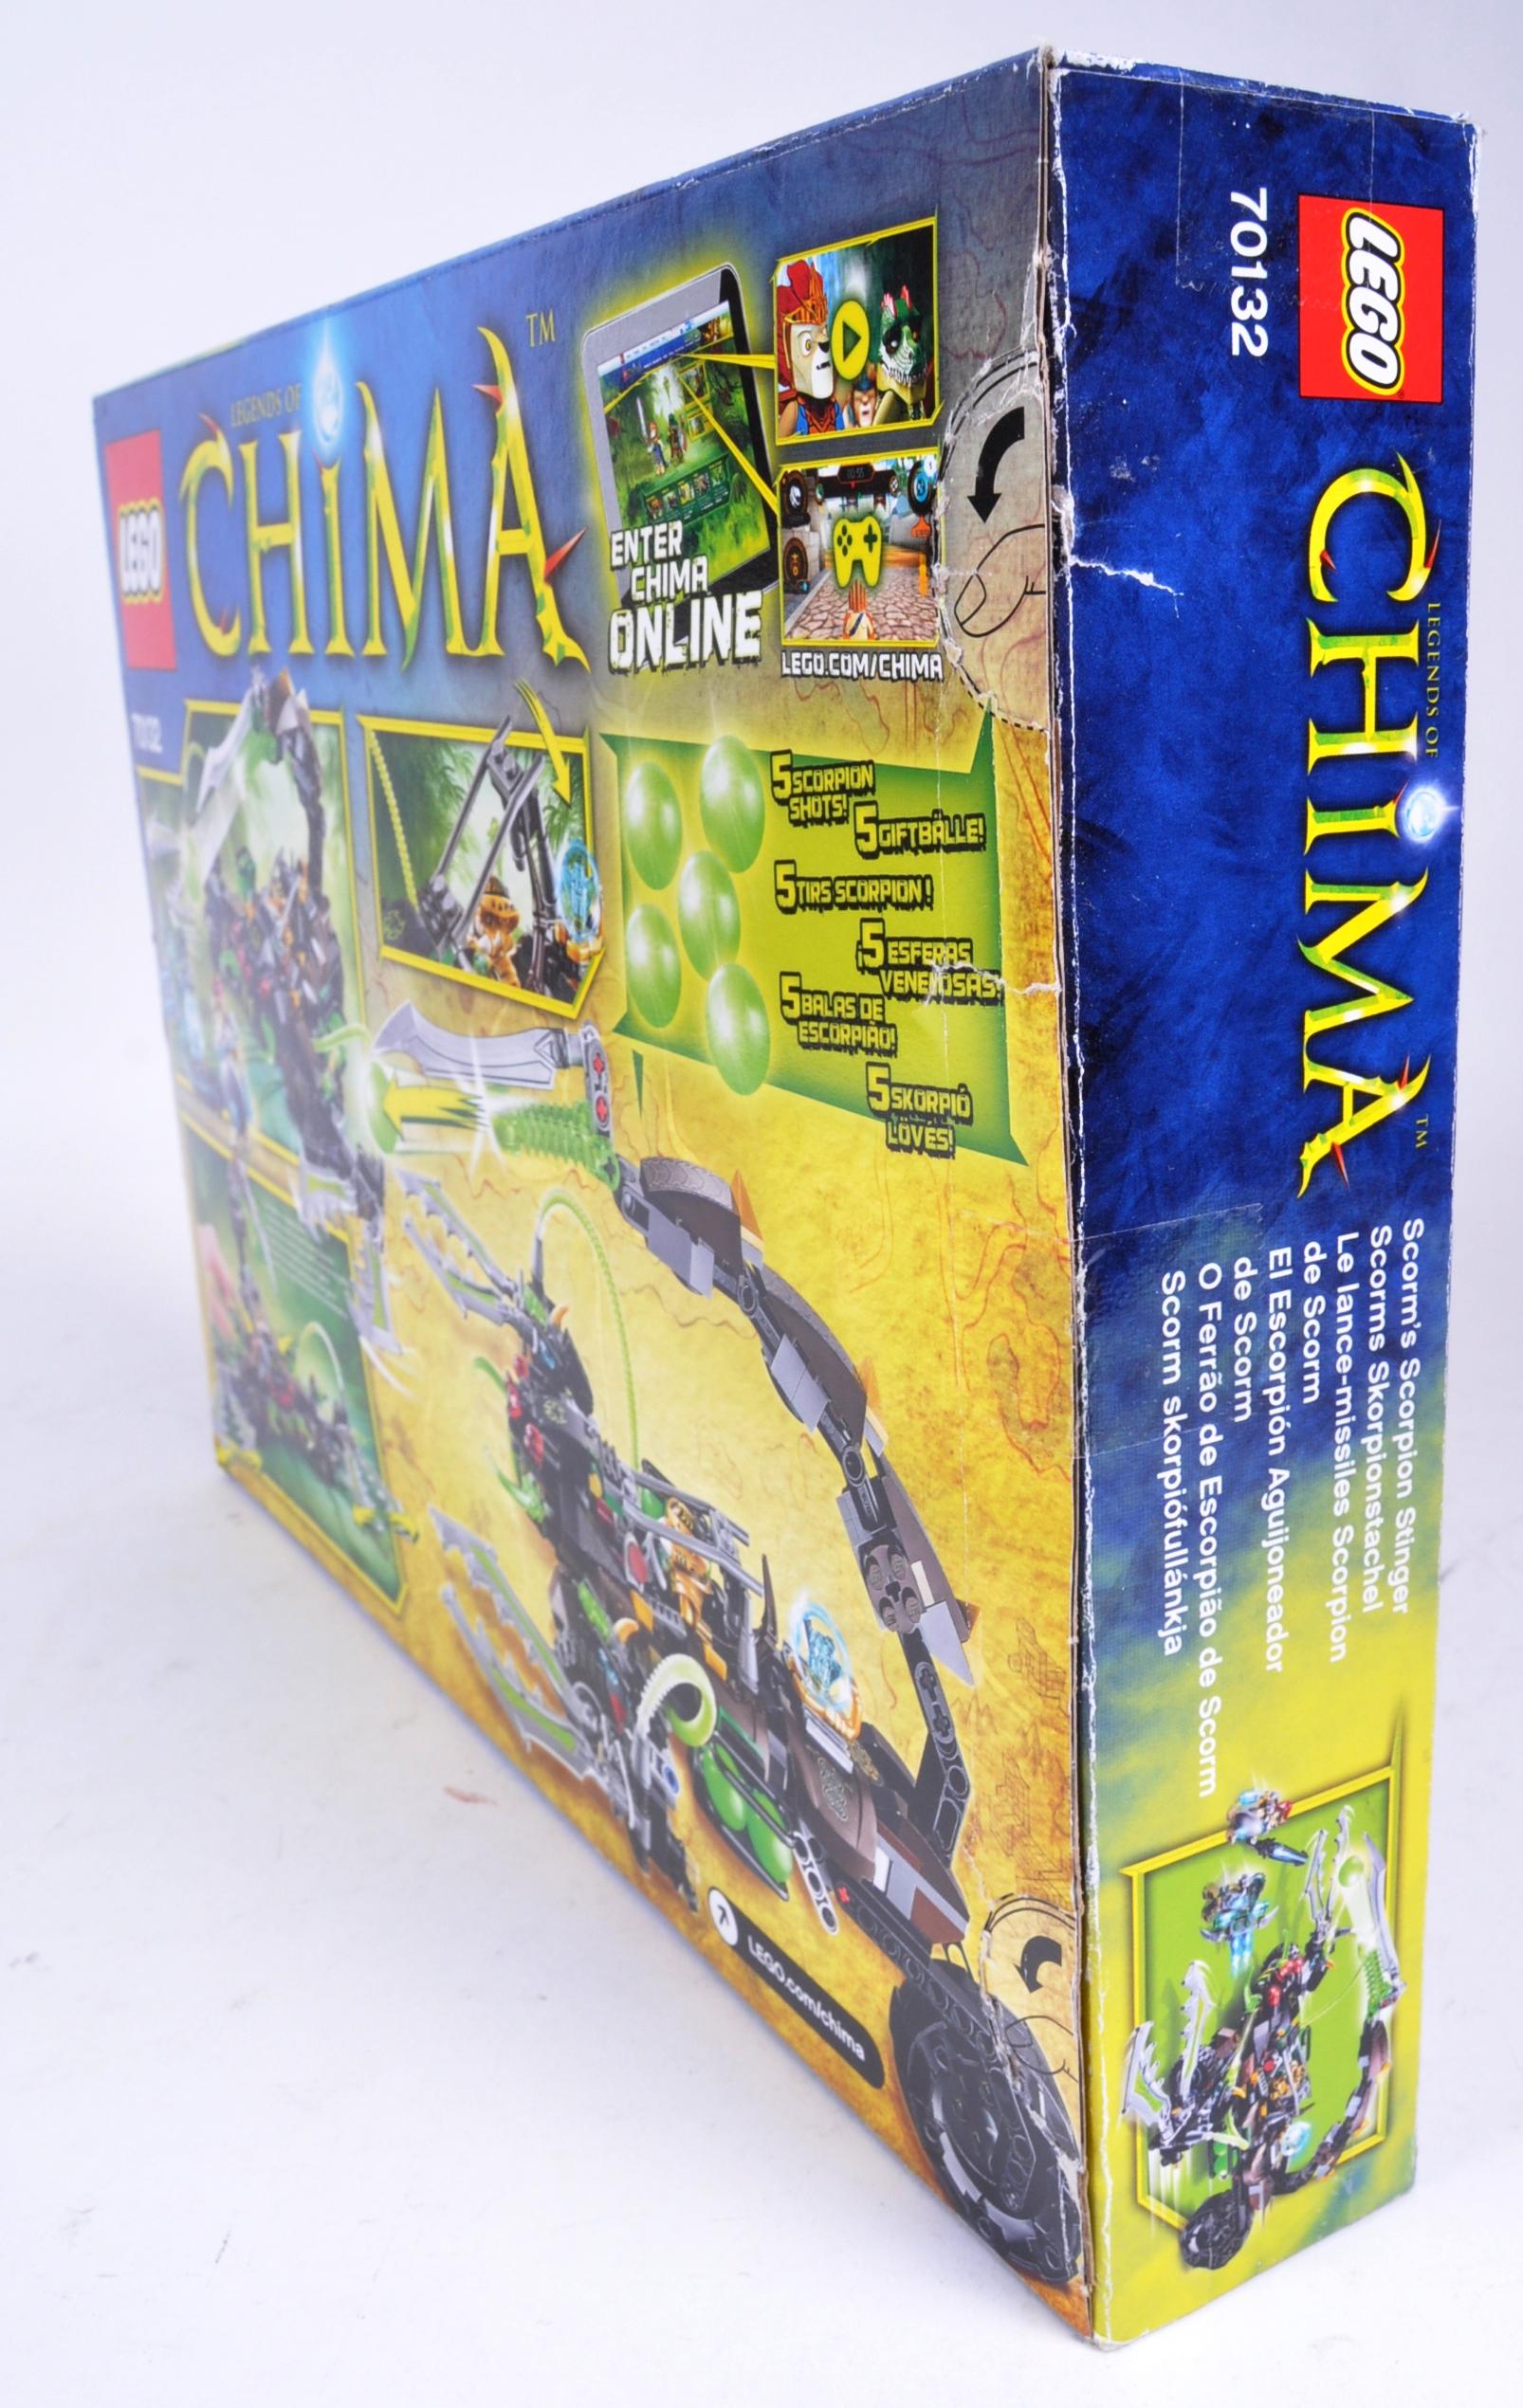 LEGO SETS - LEGENDS OF CHIMA - 70004 / 70132 - Image 5 of 6